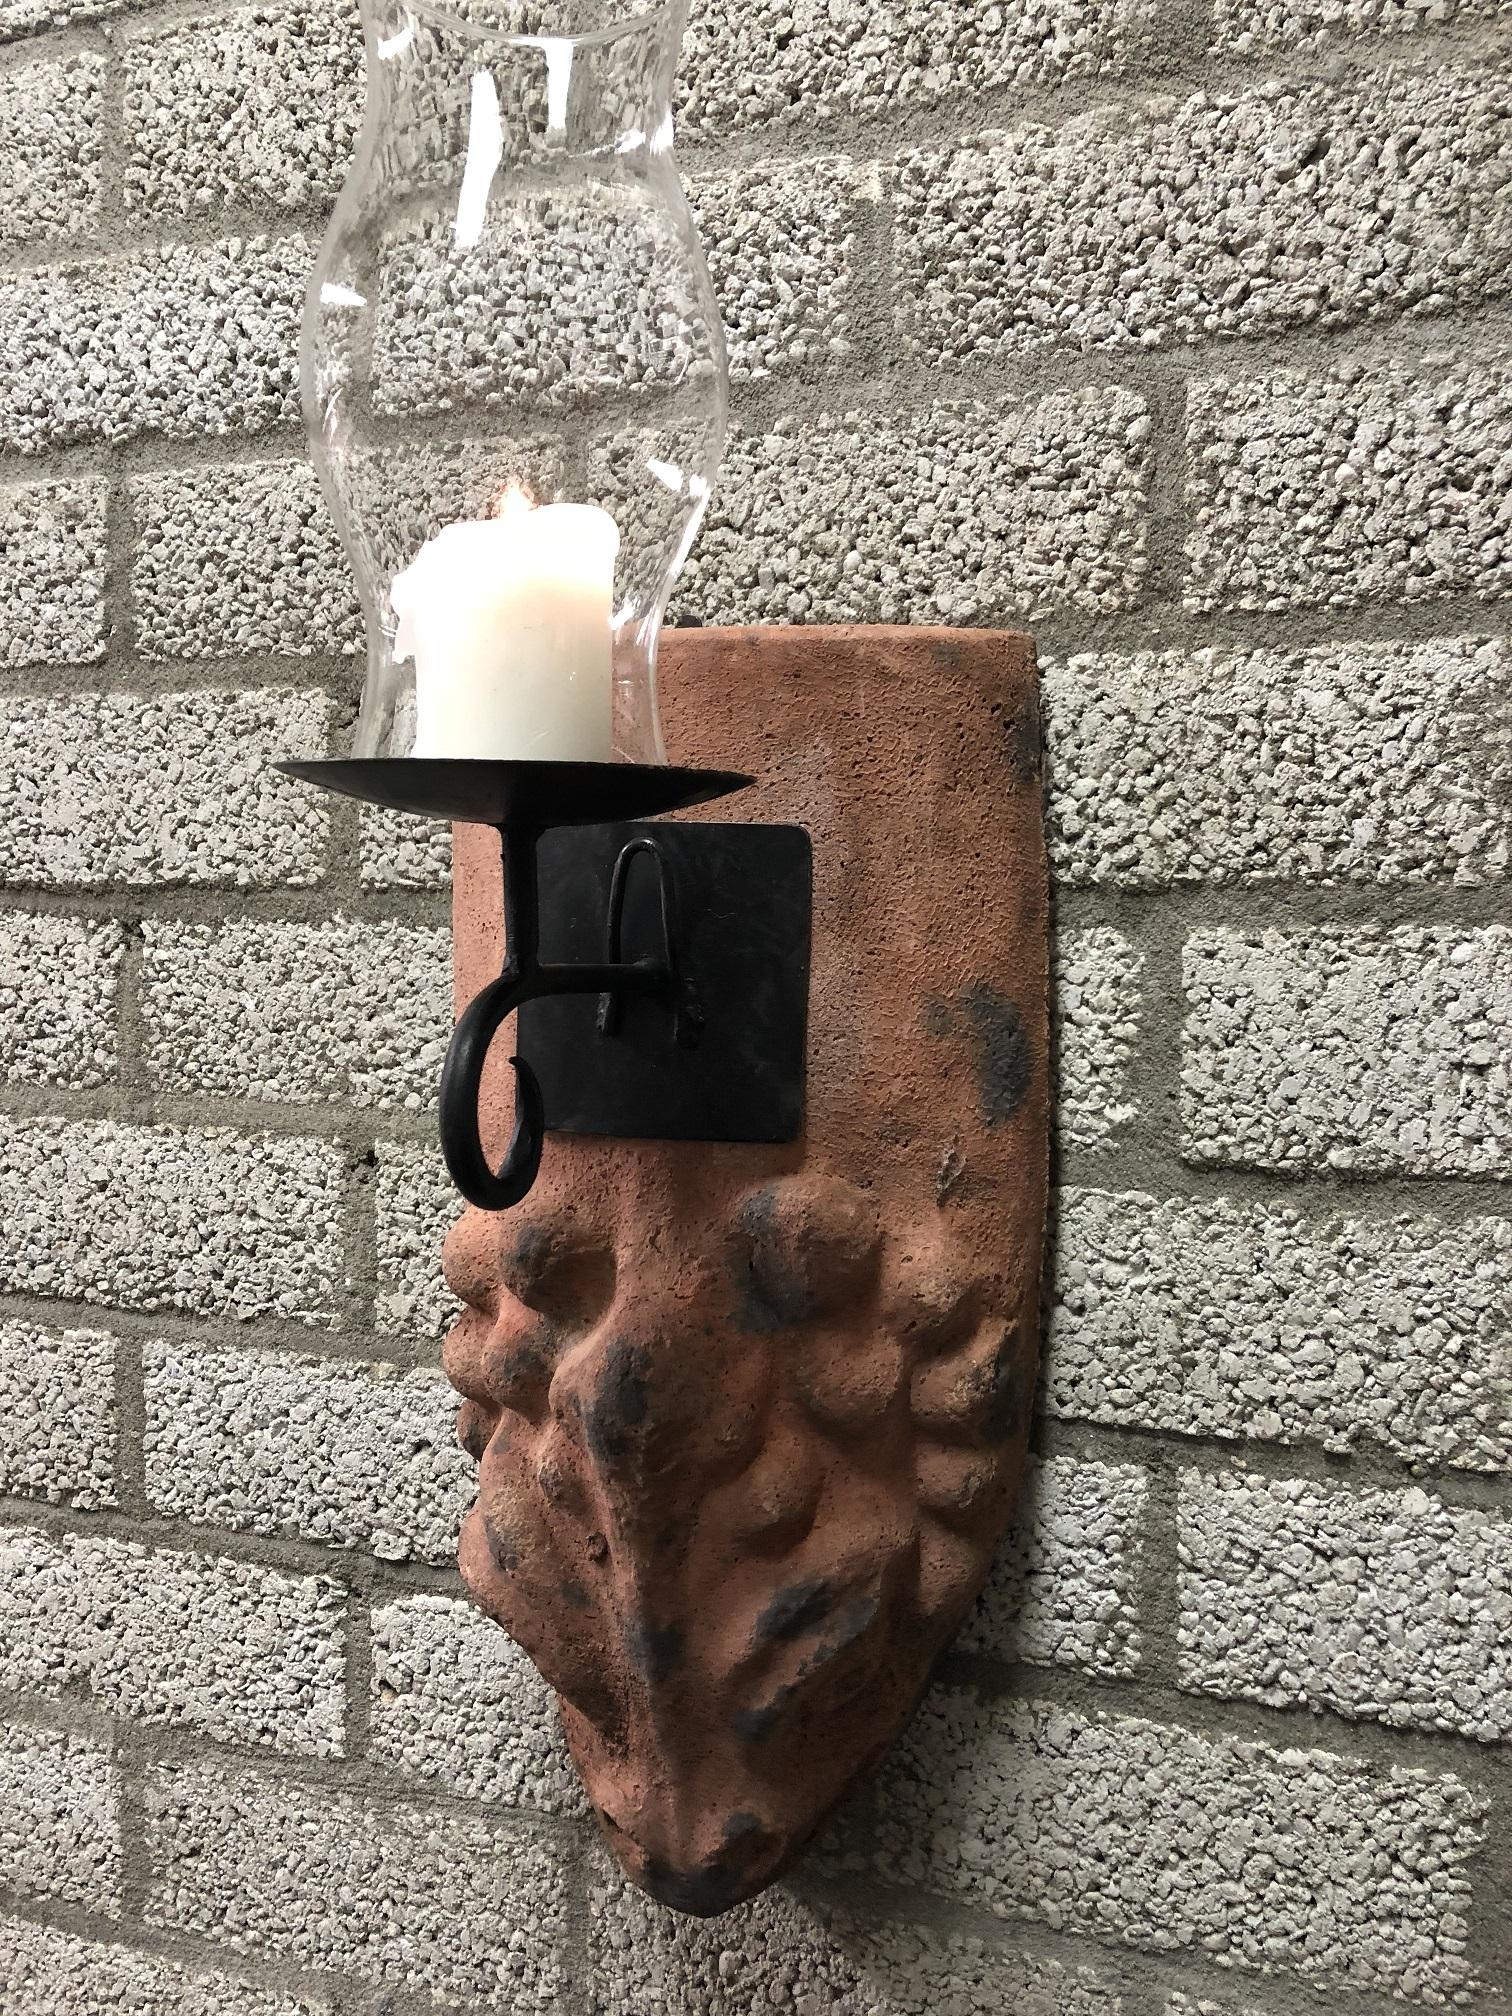 Antieke Glazen Kandelaars.Tags Decoratie Antiek Landhuis Landhuis Gastentoilet Badkamer Voordeur Keuken Mediterrane Mediterrane Stijl Lamp Lantaarn Wandlampen